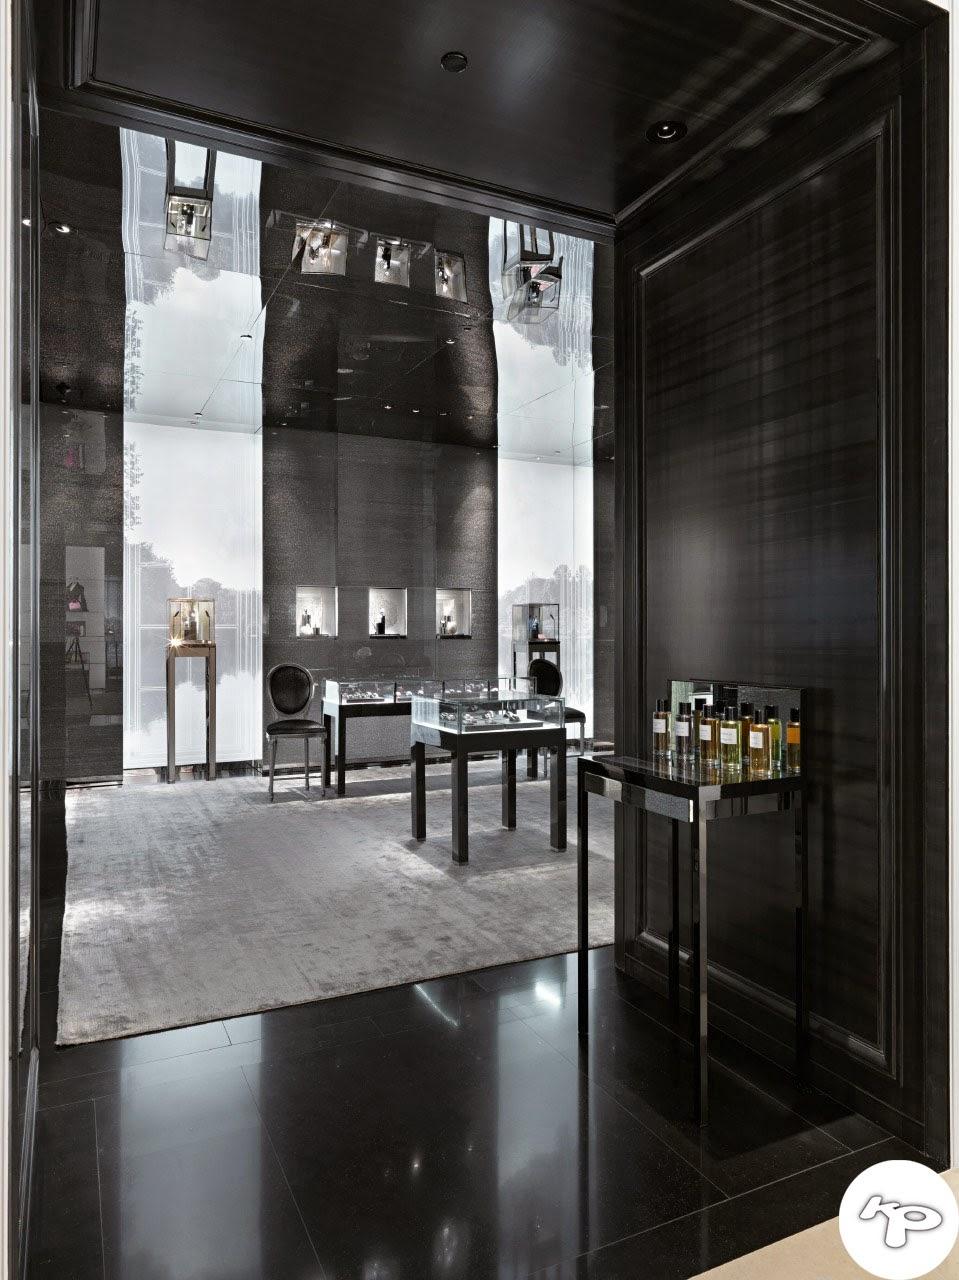 photos dior starhill kuala lumpur malaisie photographe d 39 architecture paris. Black Bedroom Furniture Sets. Home Design Ideas